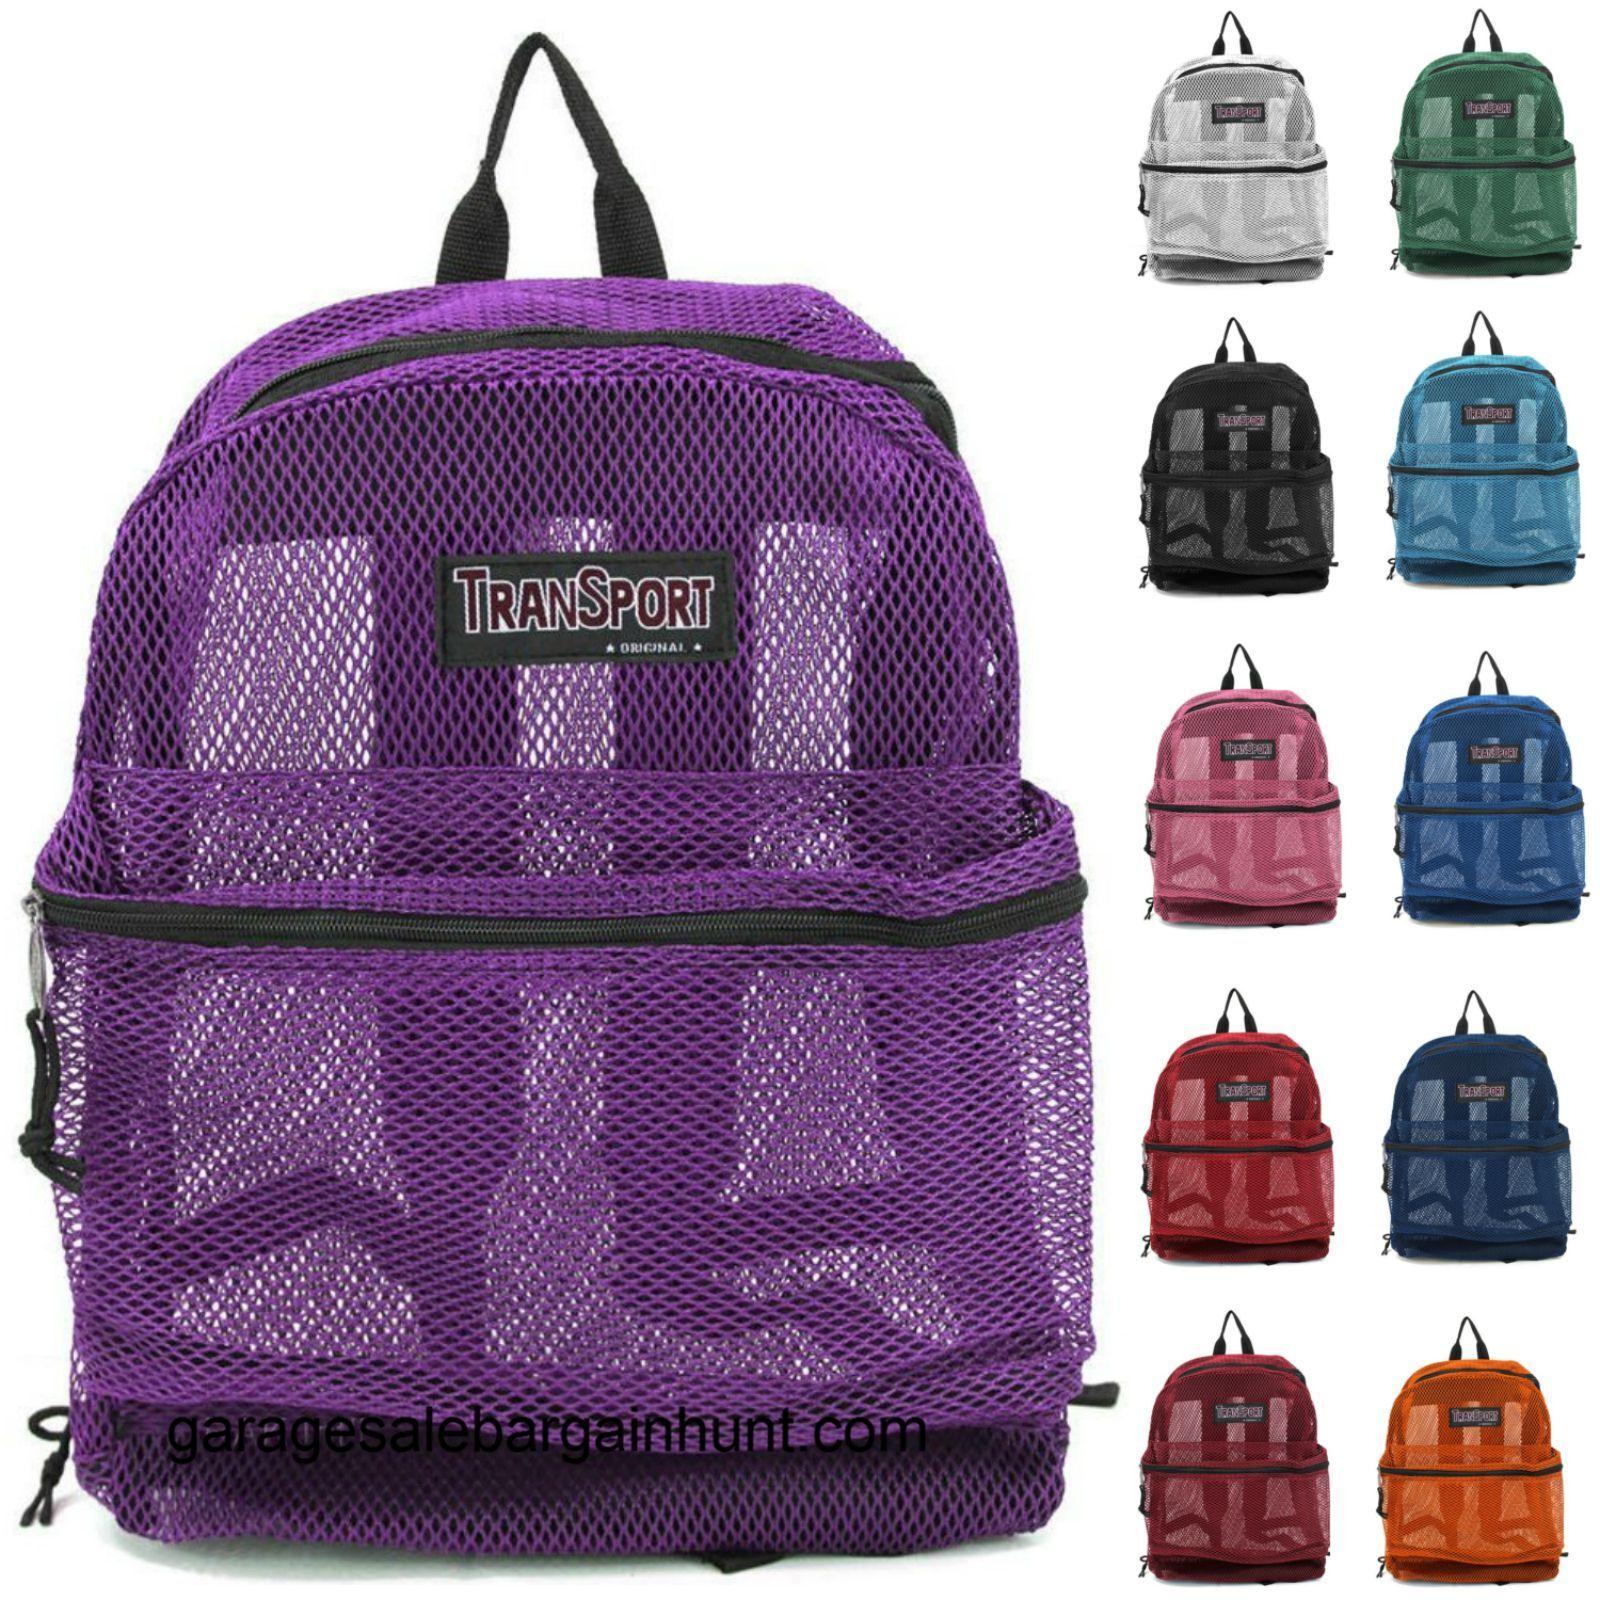 Transparent See Through Mesh Backpack Book Bag Kids Back To School Sack 17